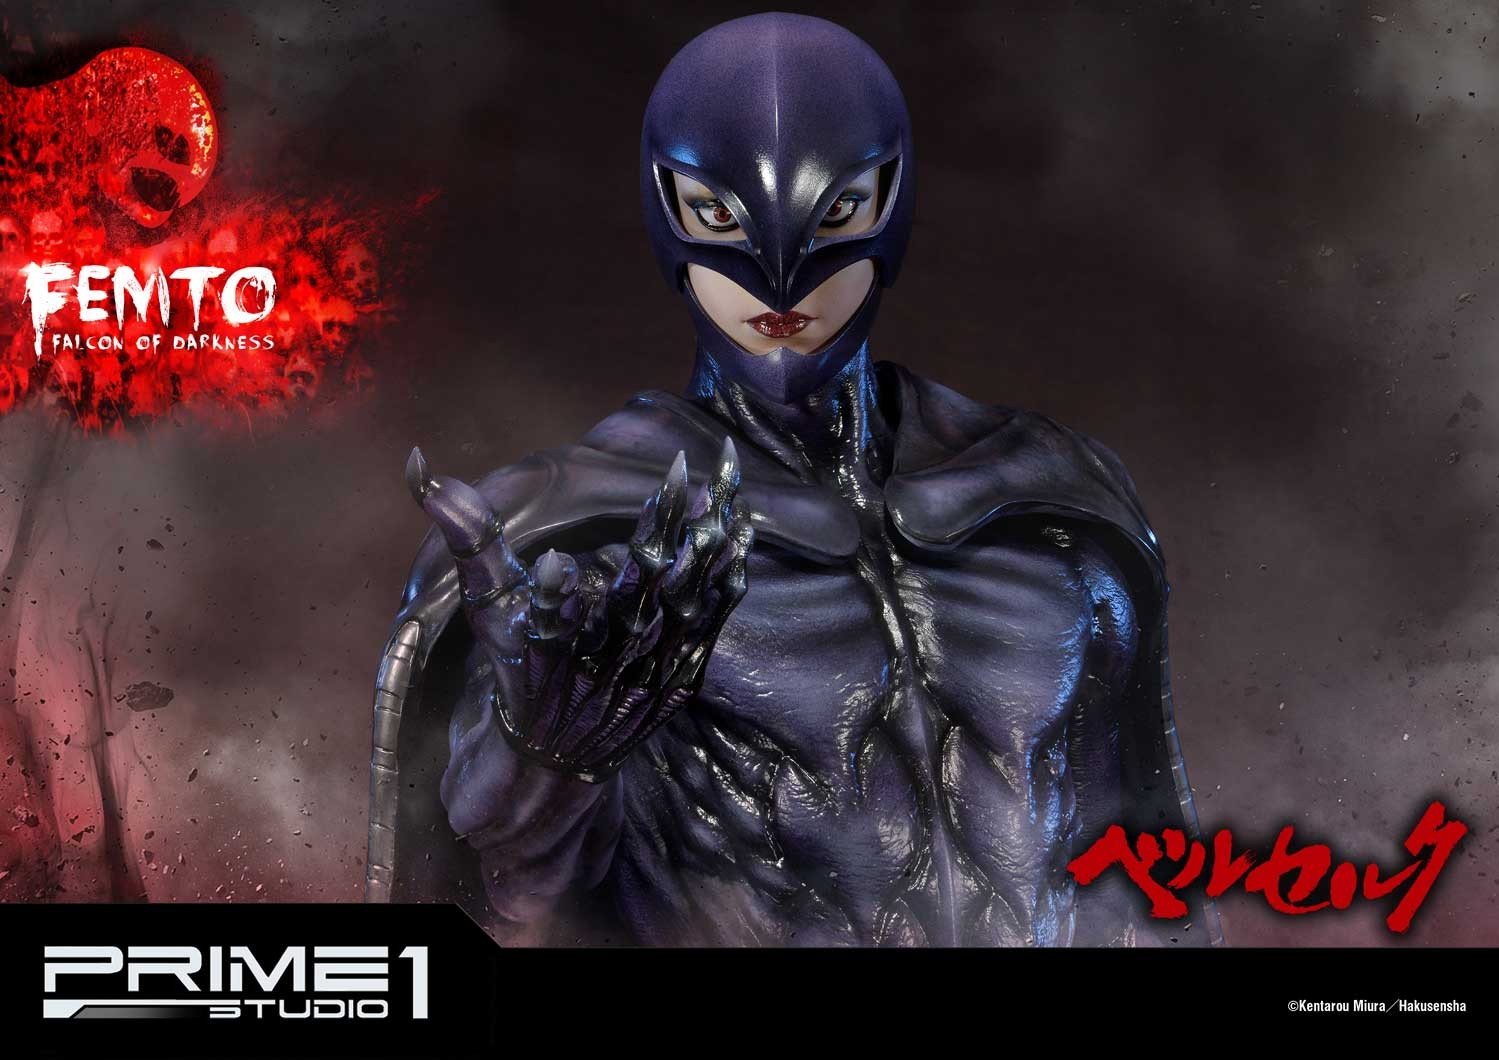 Link a Berserk Femto Falcon of Darkness Ultimate Premium Masterline Prime 1 Studio Itakon.it 27